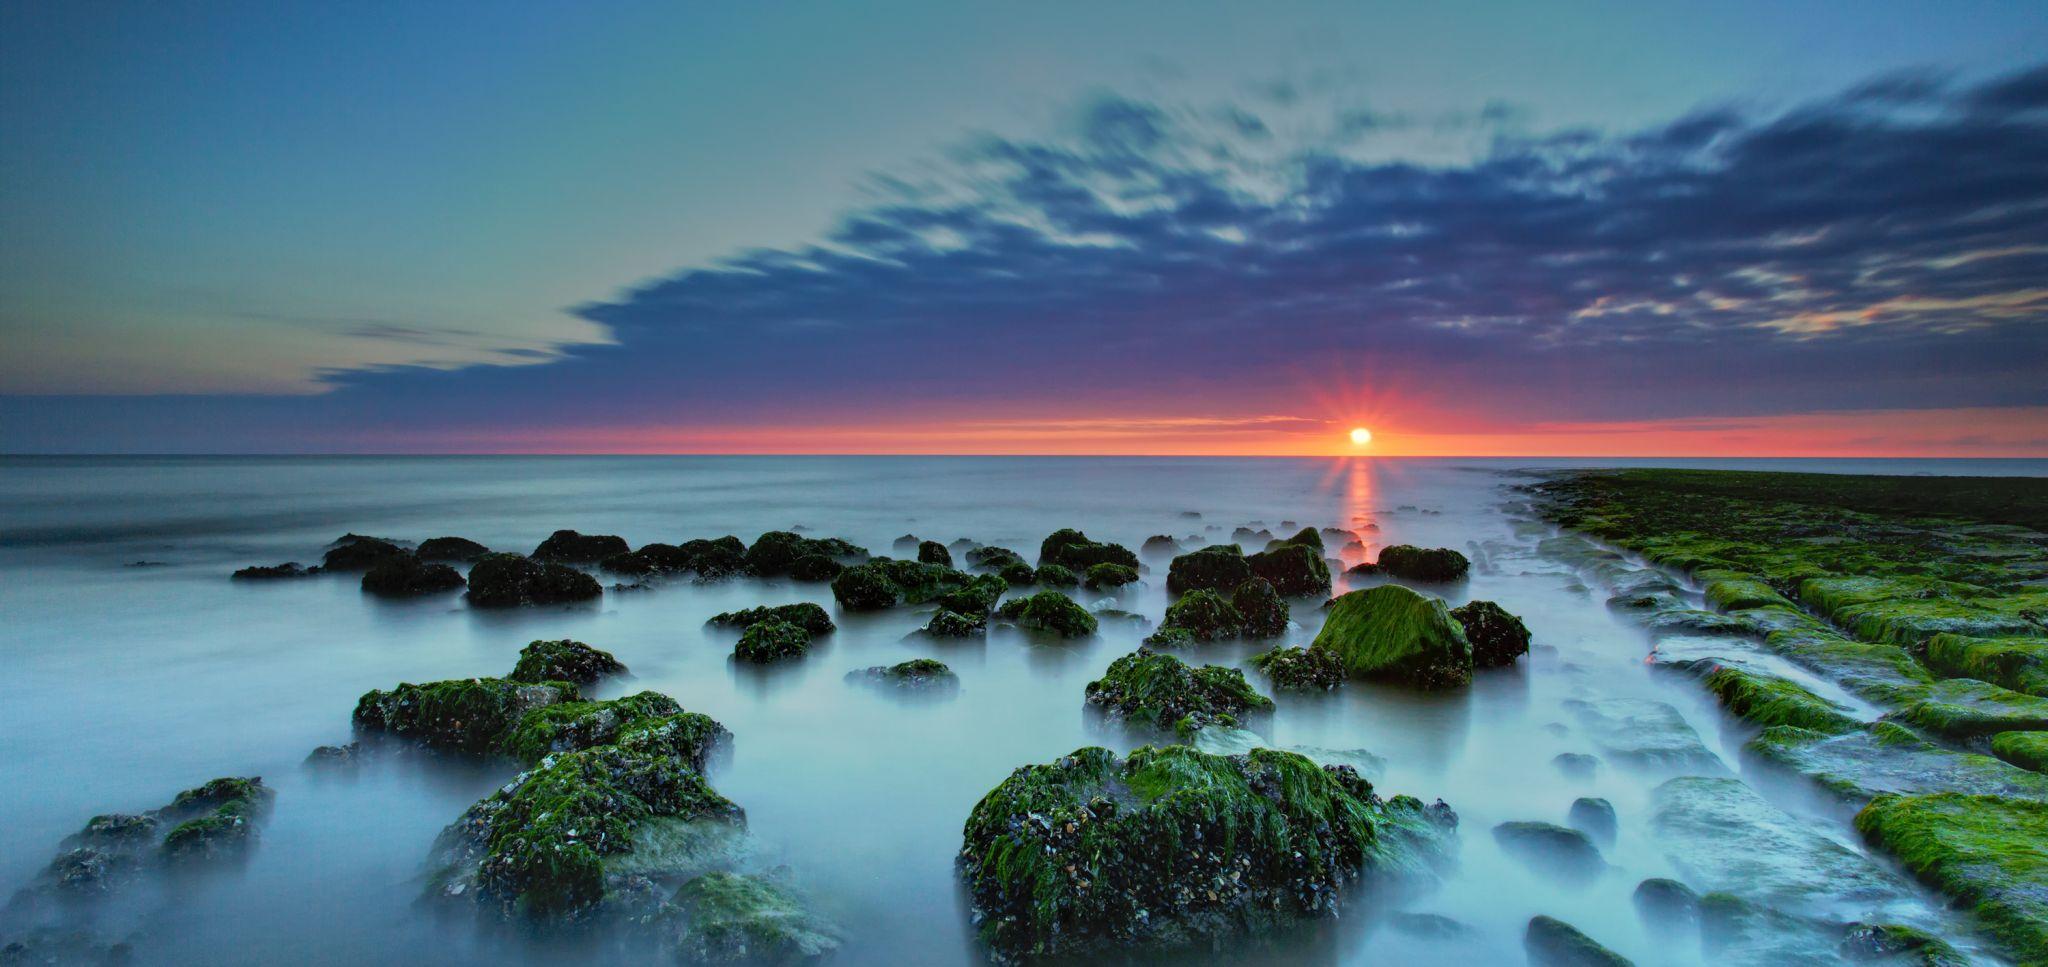 crab sunset, Netherlands